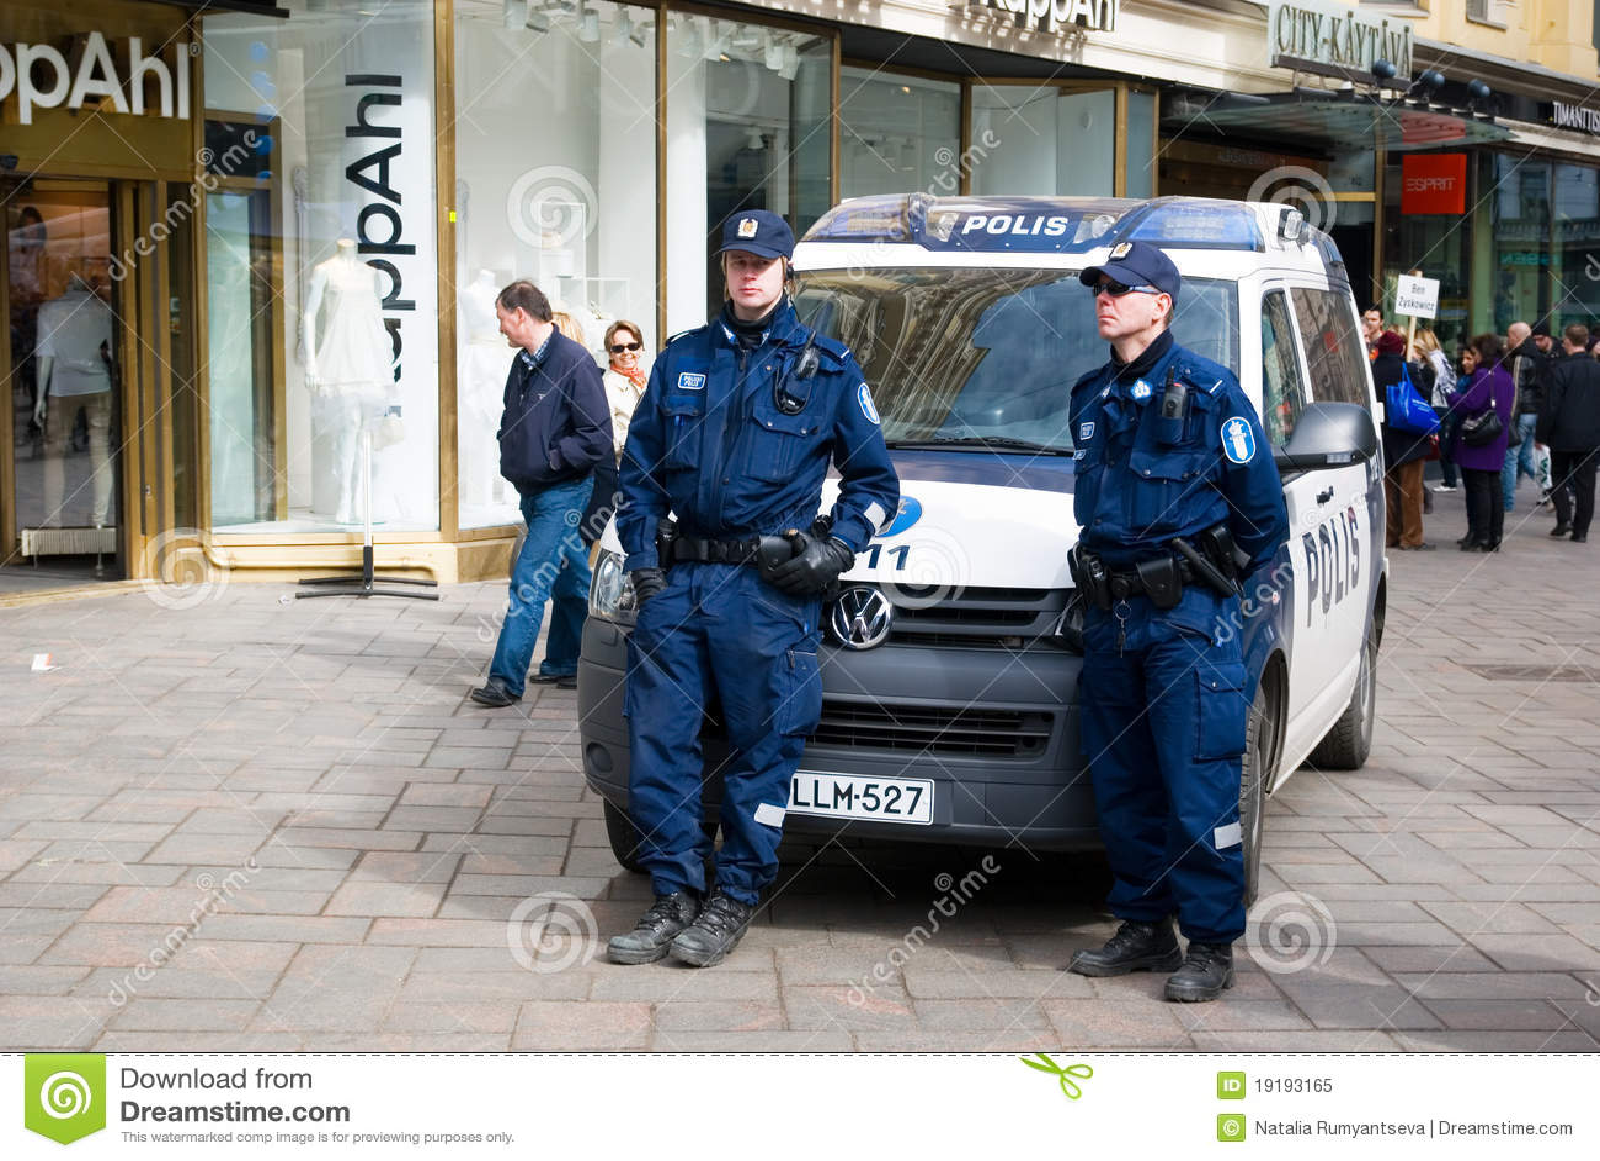 Two finnish policemen keep order. Helsinki. Finland.